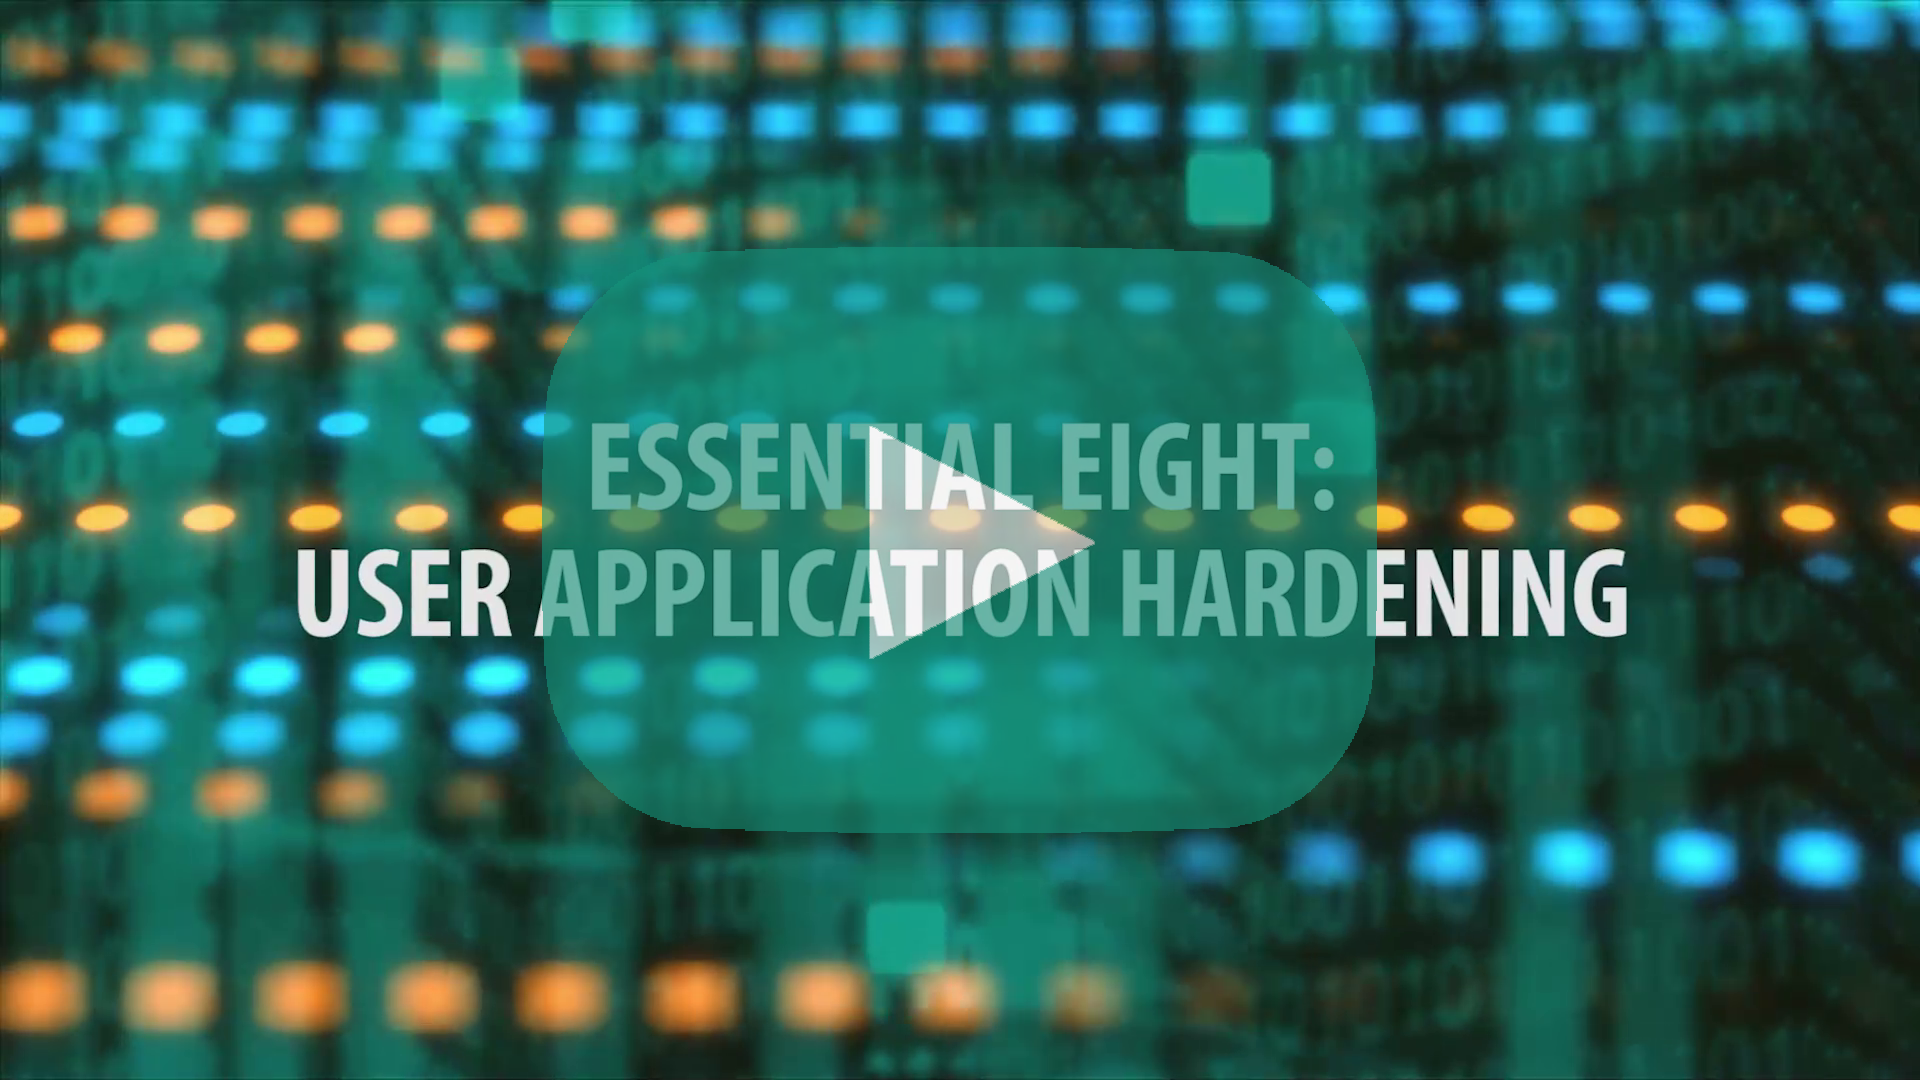 E8 Topic 7: User application hardening